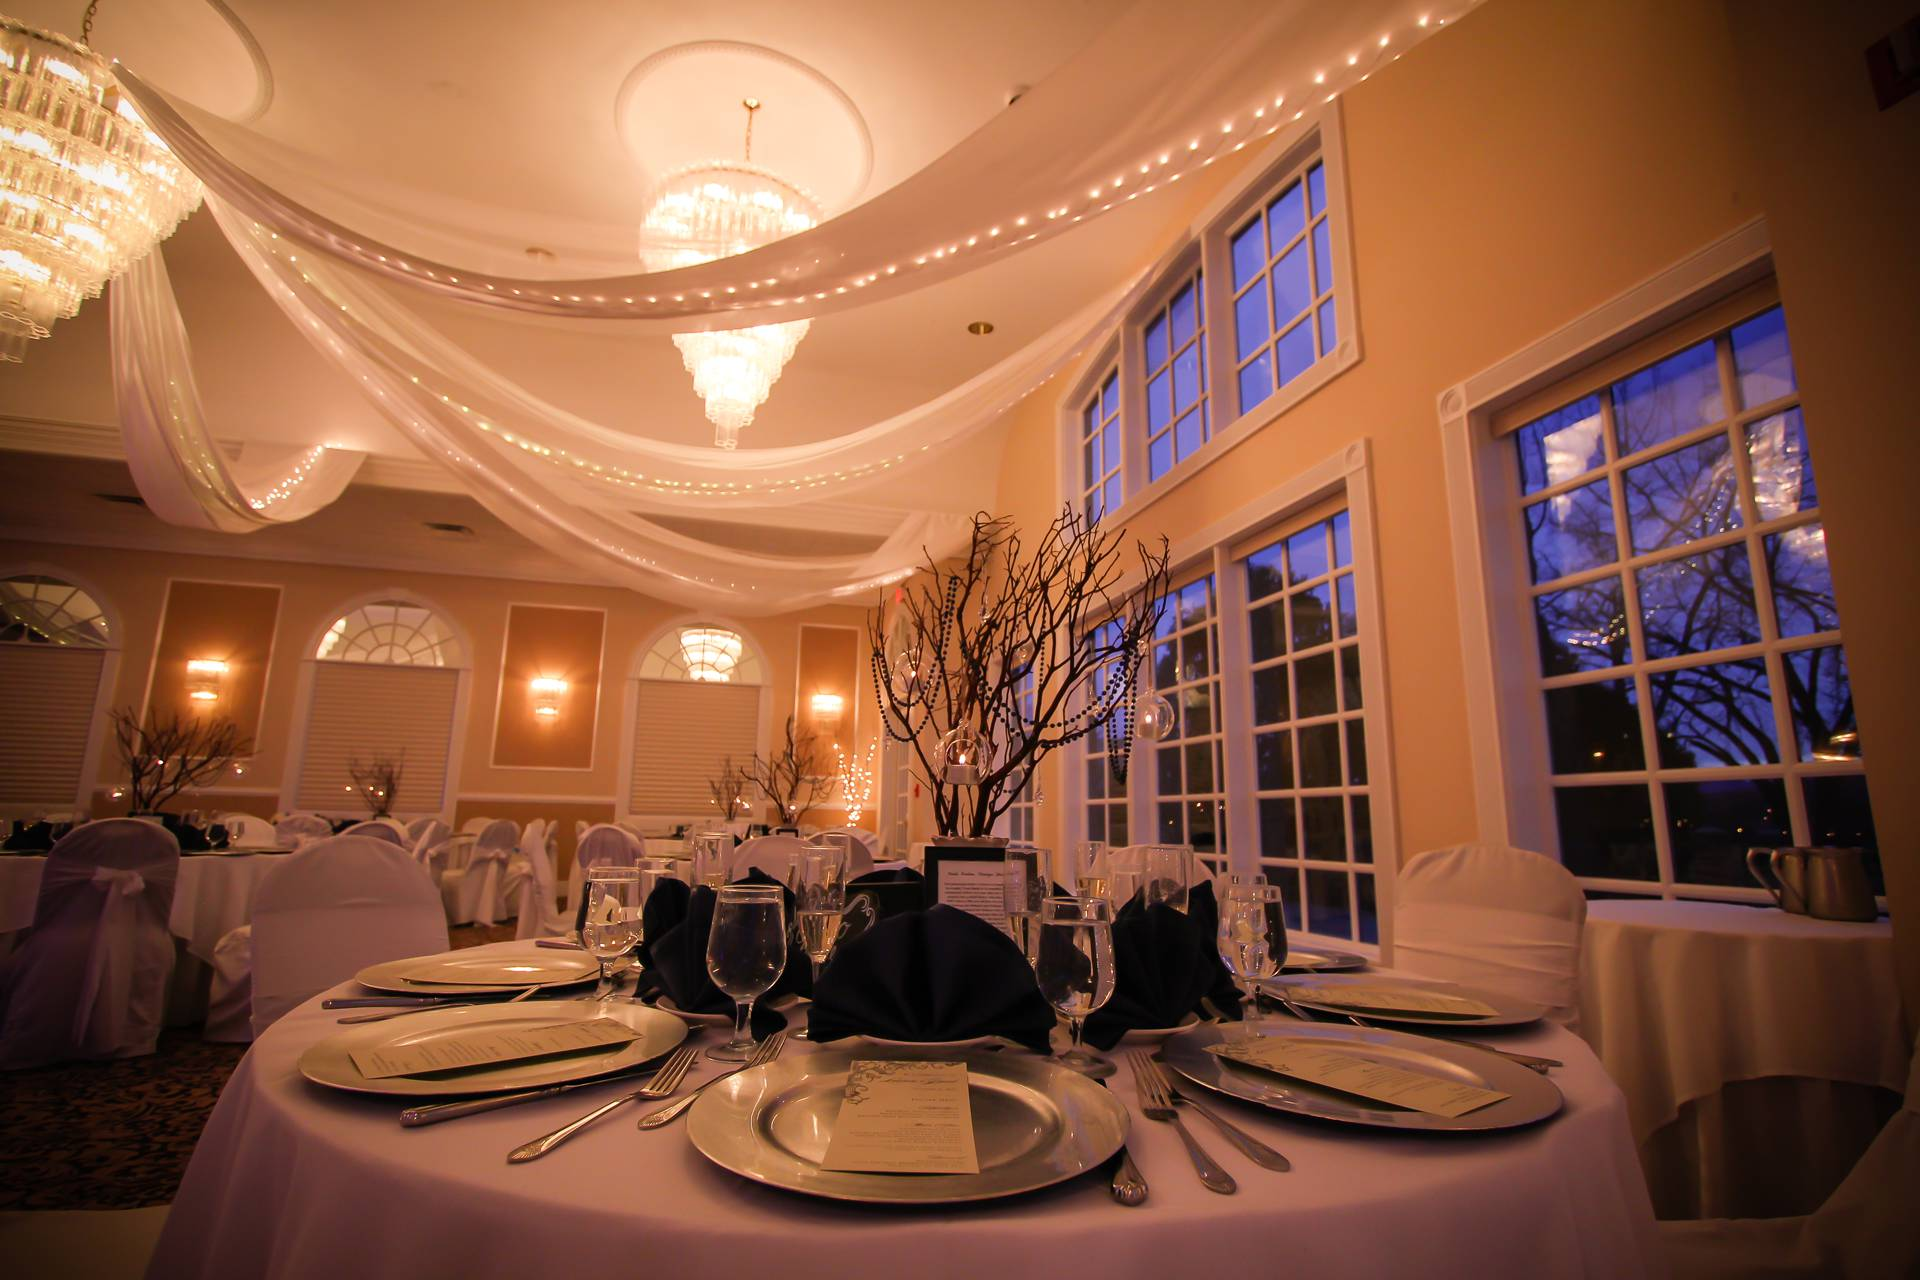 wedding venues Schenectady, NY